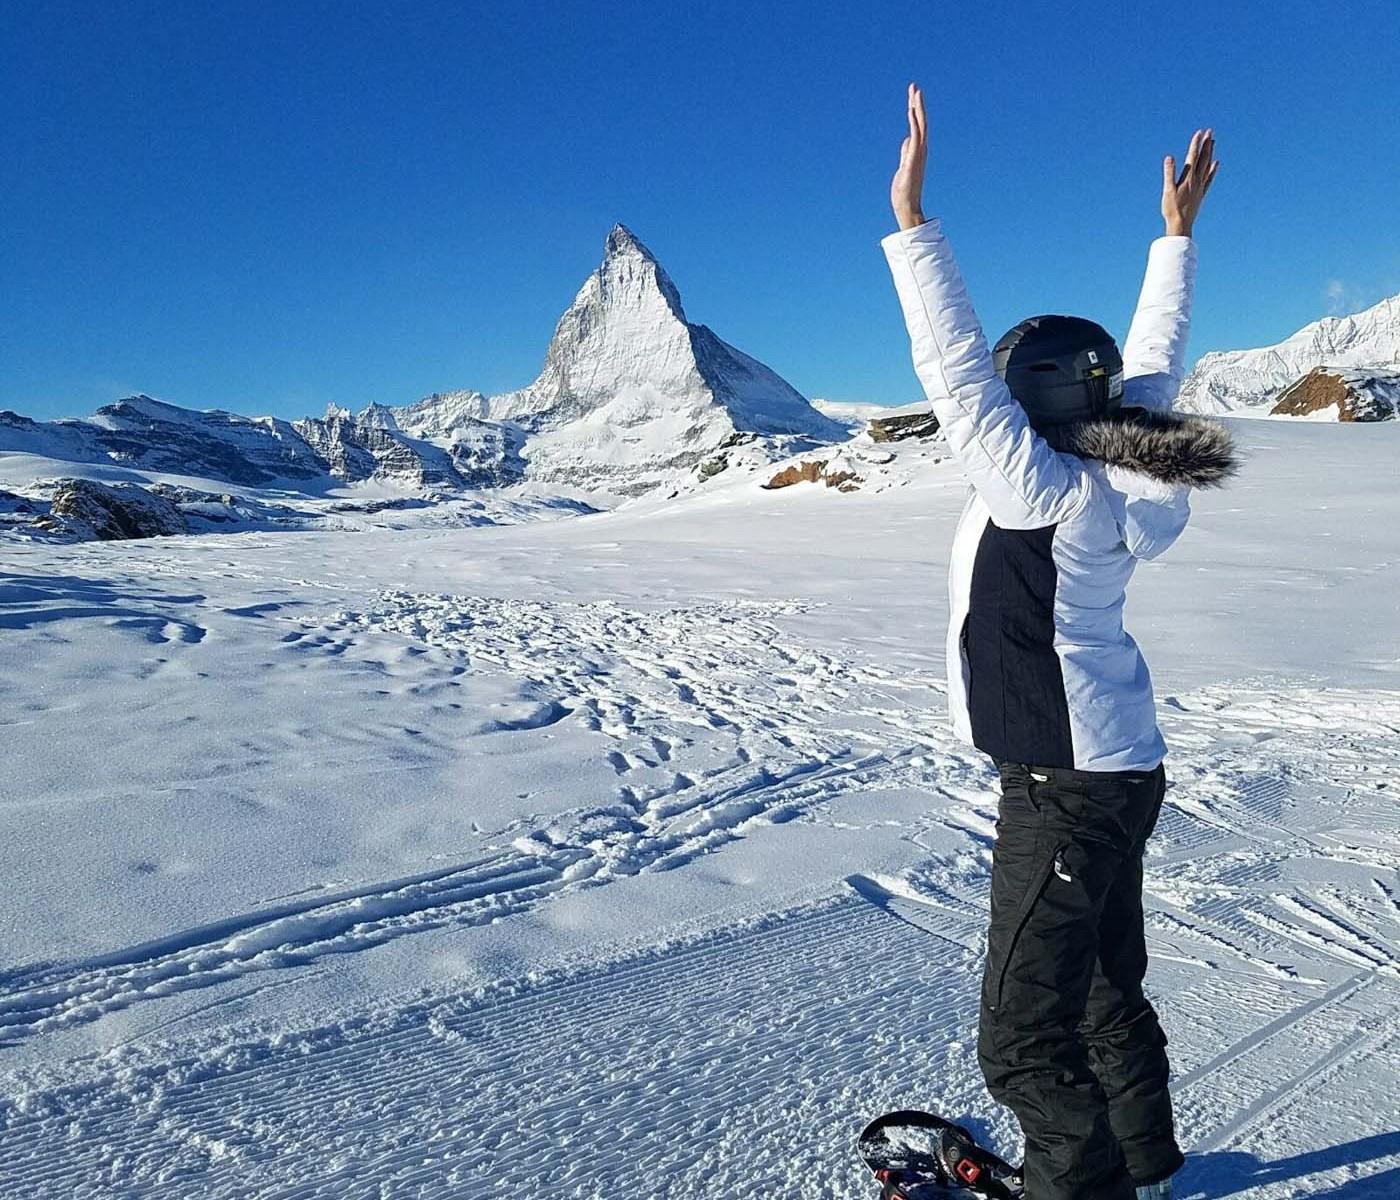 Glamping Blog News 8 Winter Activities Snowboarding Main by Lacy - Kristen Kellogg